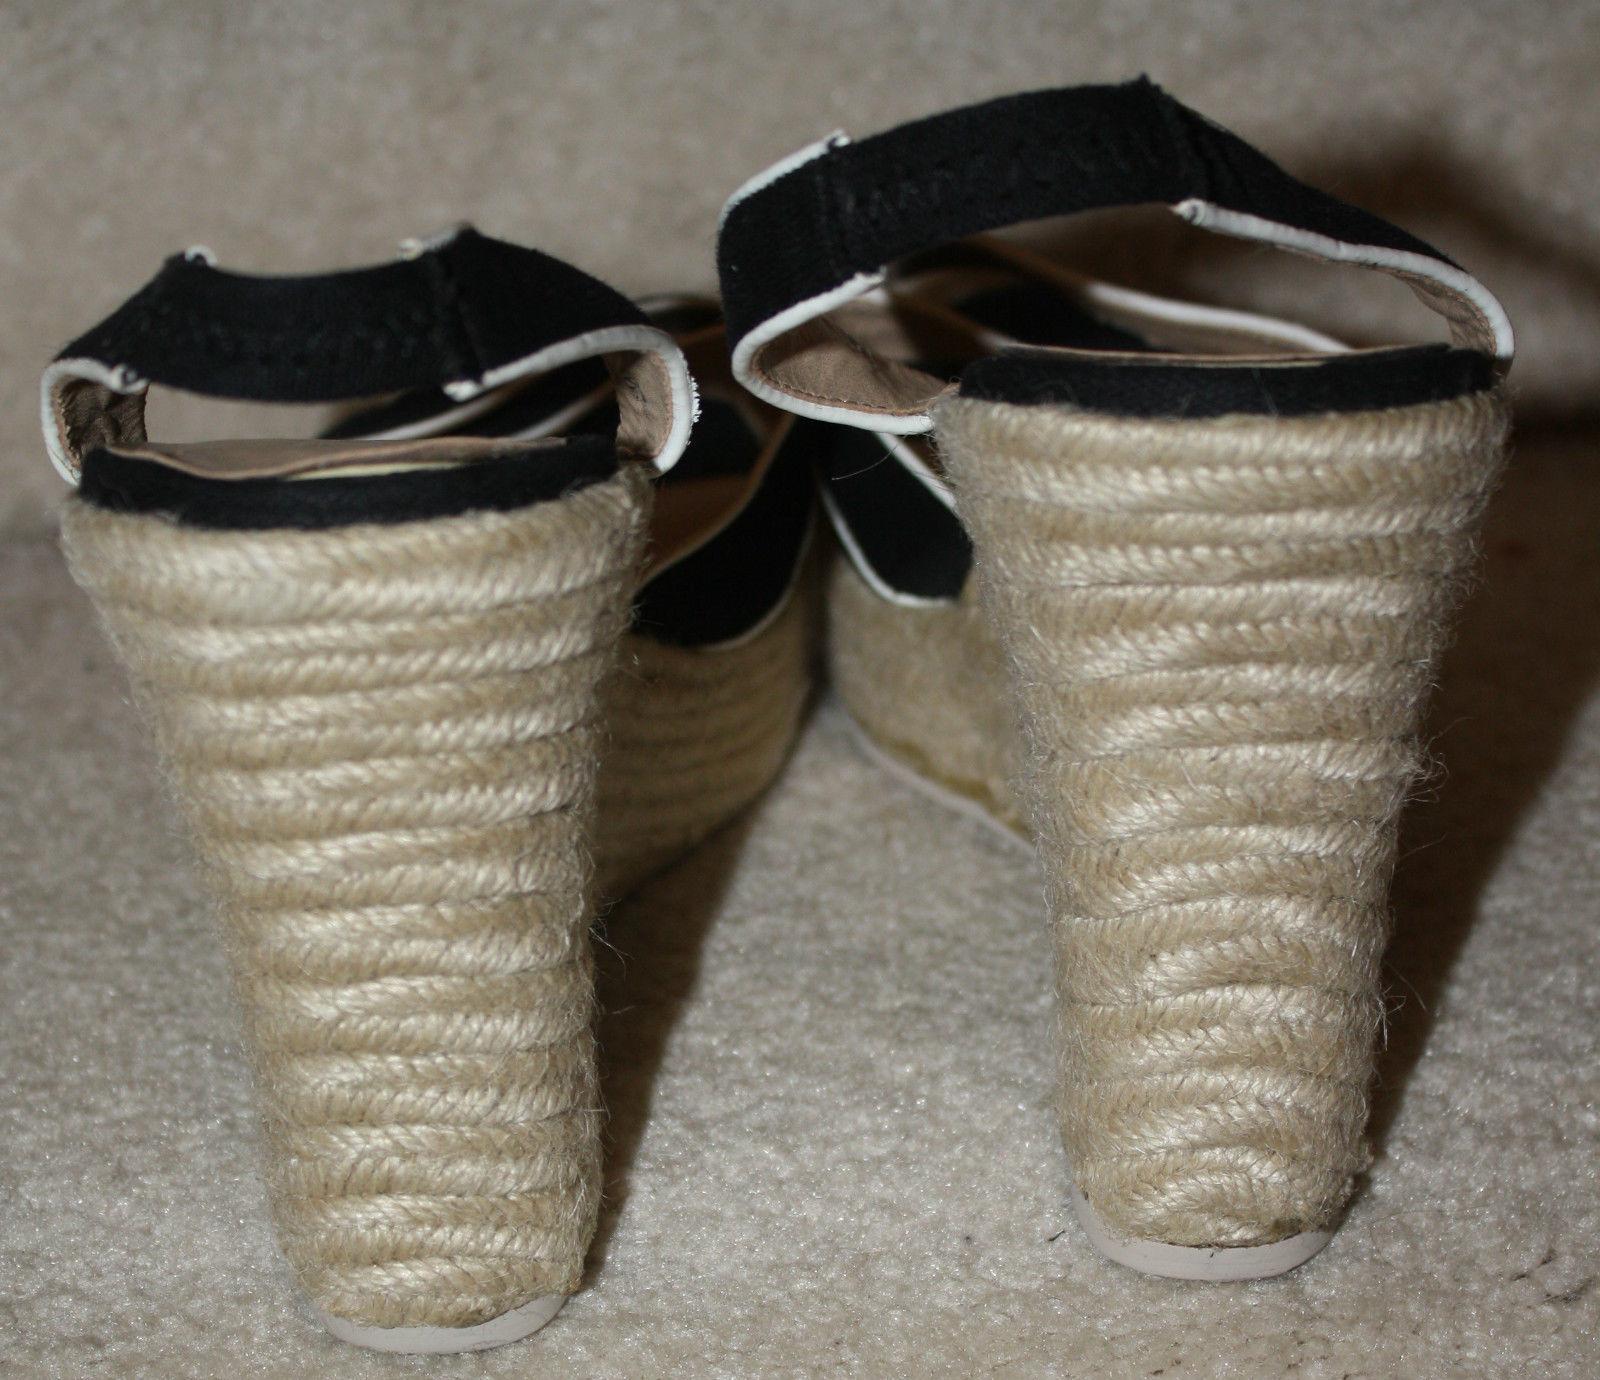 043238f25f456a Victoria s Secret Colin Stuart Black Wedge Strappy Sandal Platform 234646  8.5M